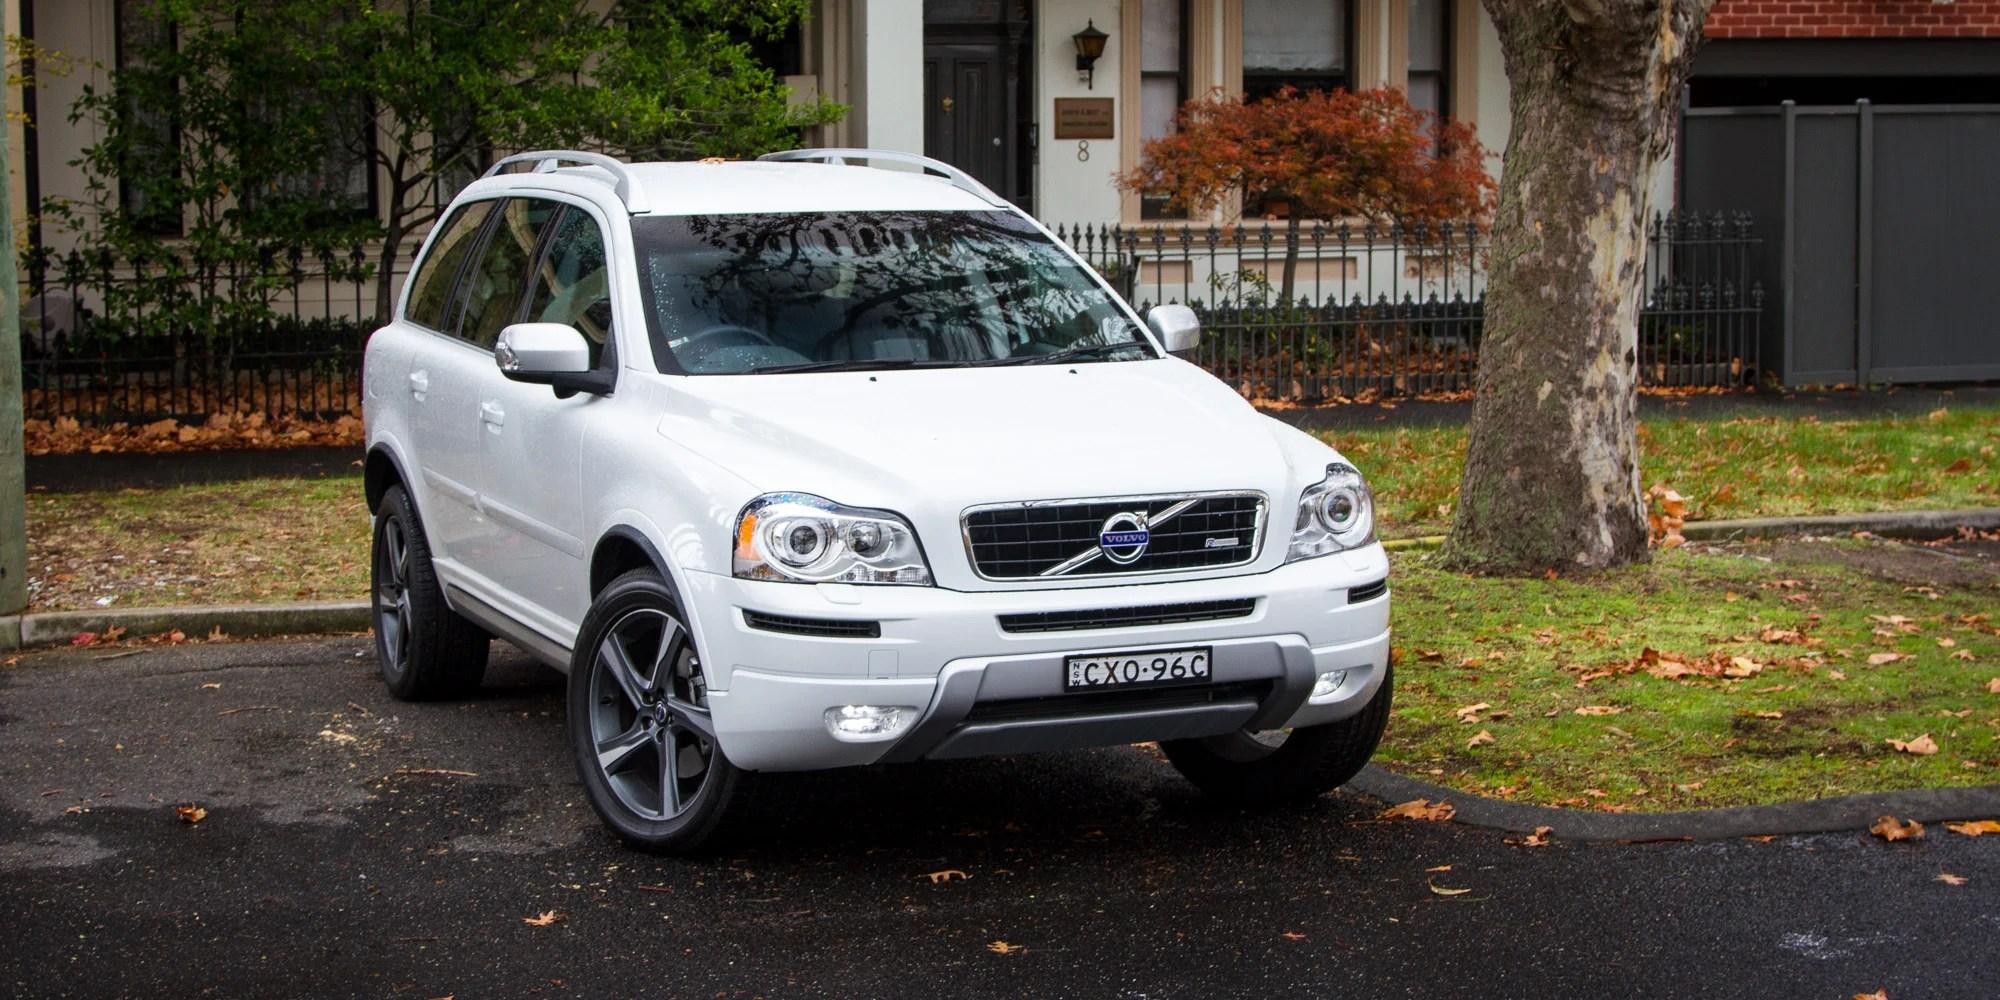 Mercedes Benz Volvo Hummer recalls announced s 1 of 3